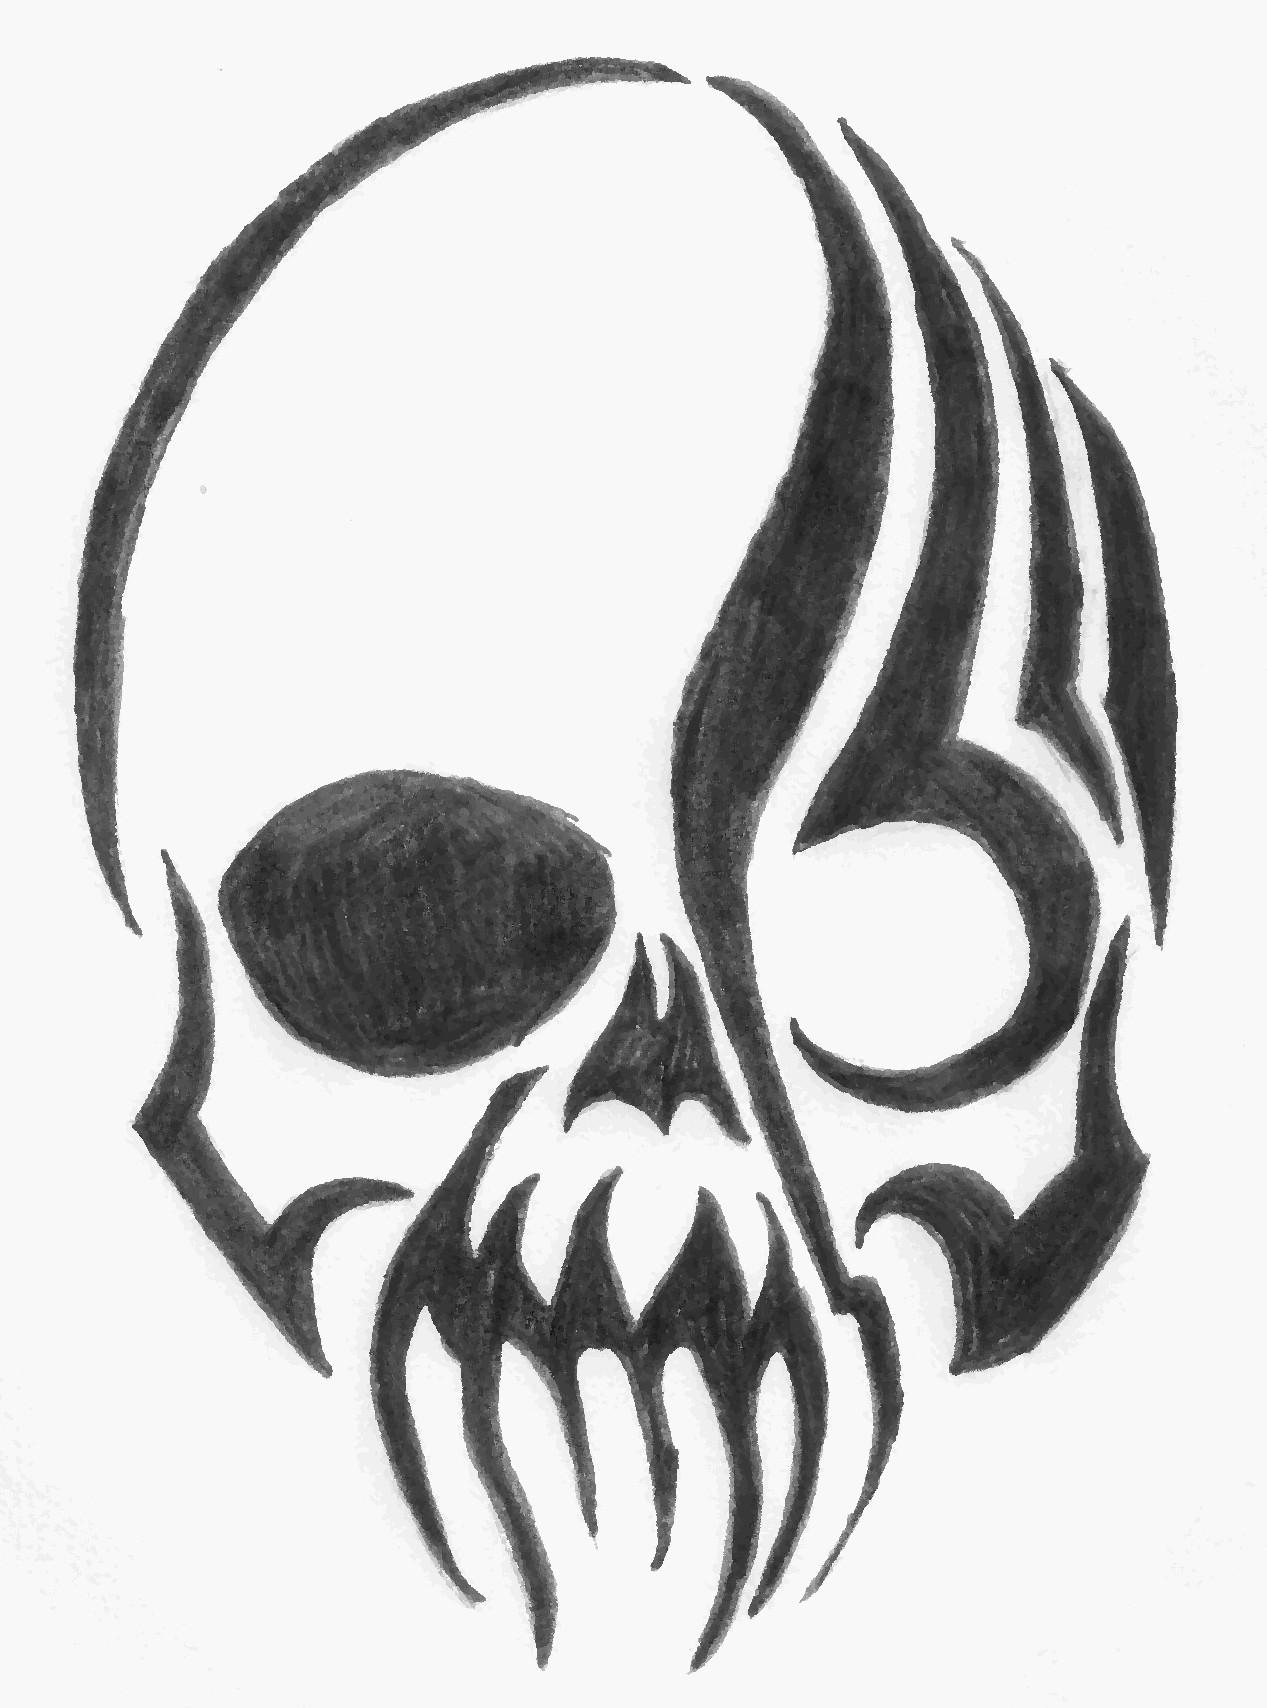 1267x1708 Cool Symbols Draw Easy Draw Skull Design Images Cute Birthday Ideas